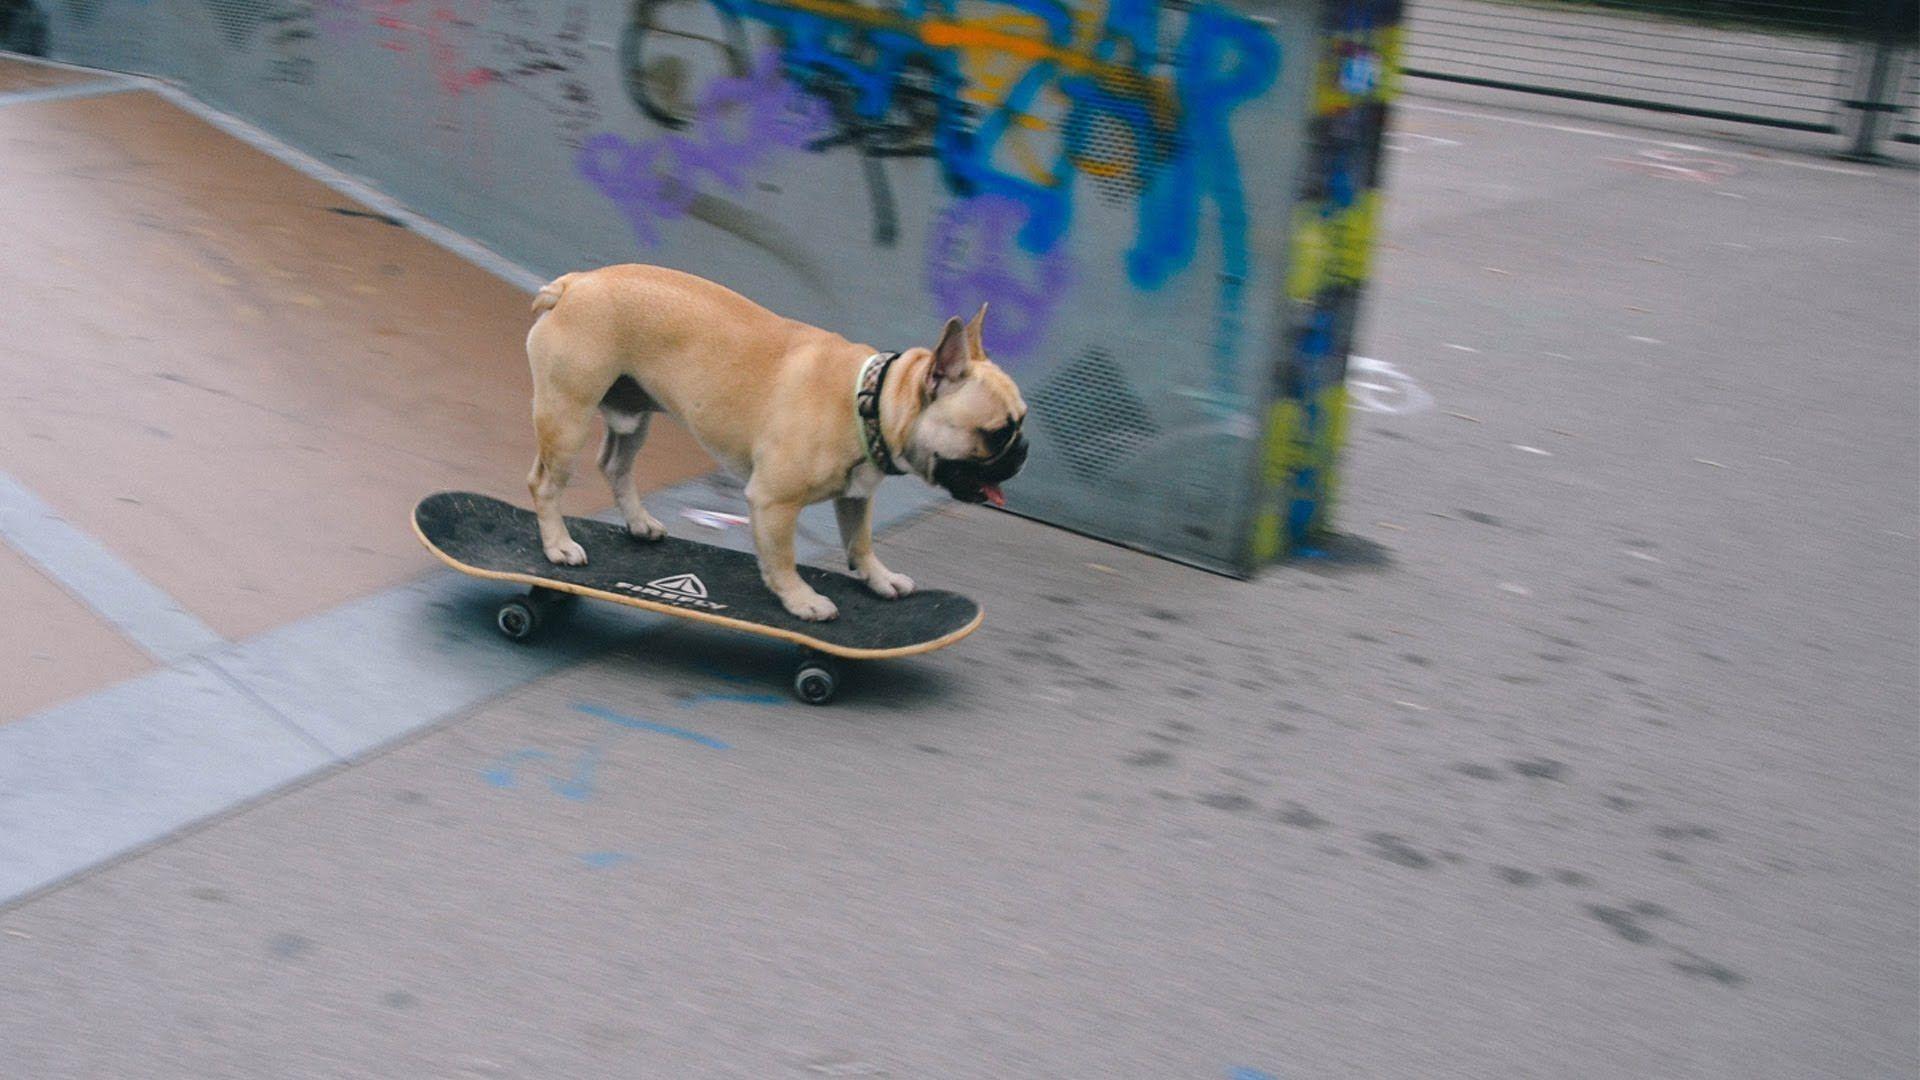 Hello Friends Bulldogs Pets Dogs Skateboarding Bullies Funny Fun Animals Frenchies Bulldog Skateboard French Bulldog Bulldog